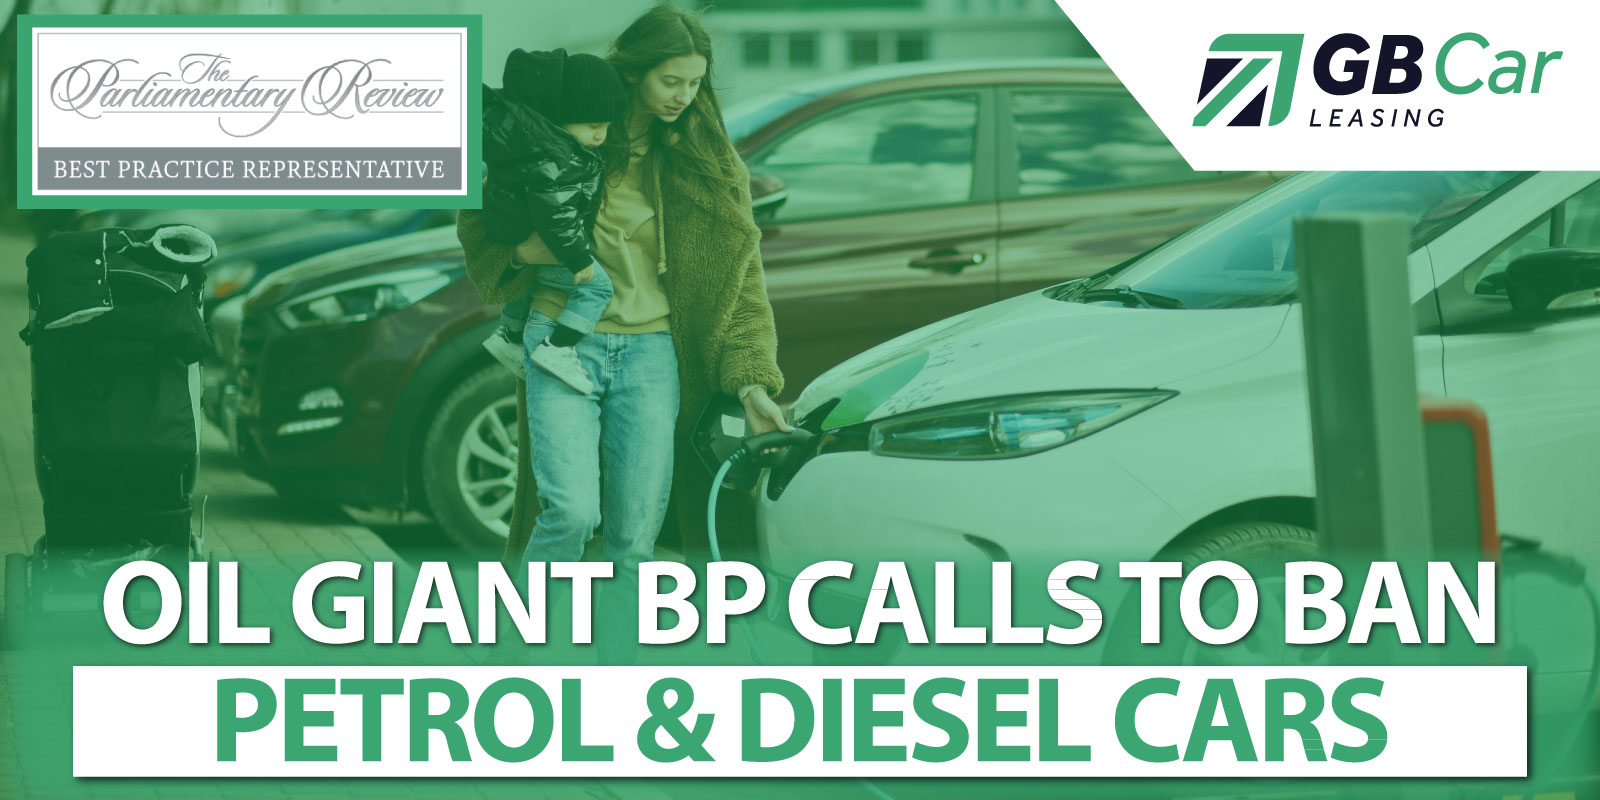 Oil giant BP says ban on petrol and diesel car sales